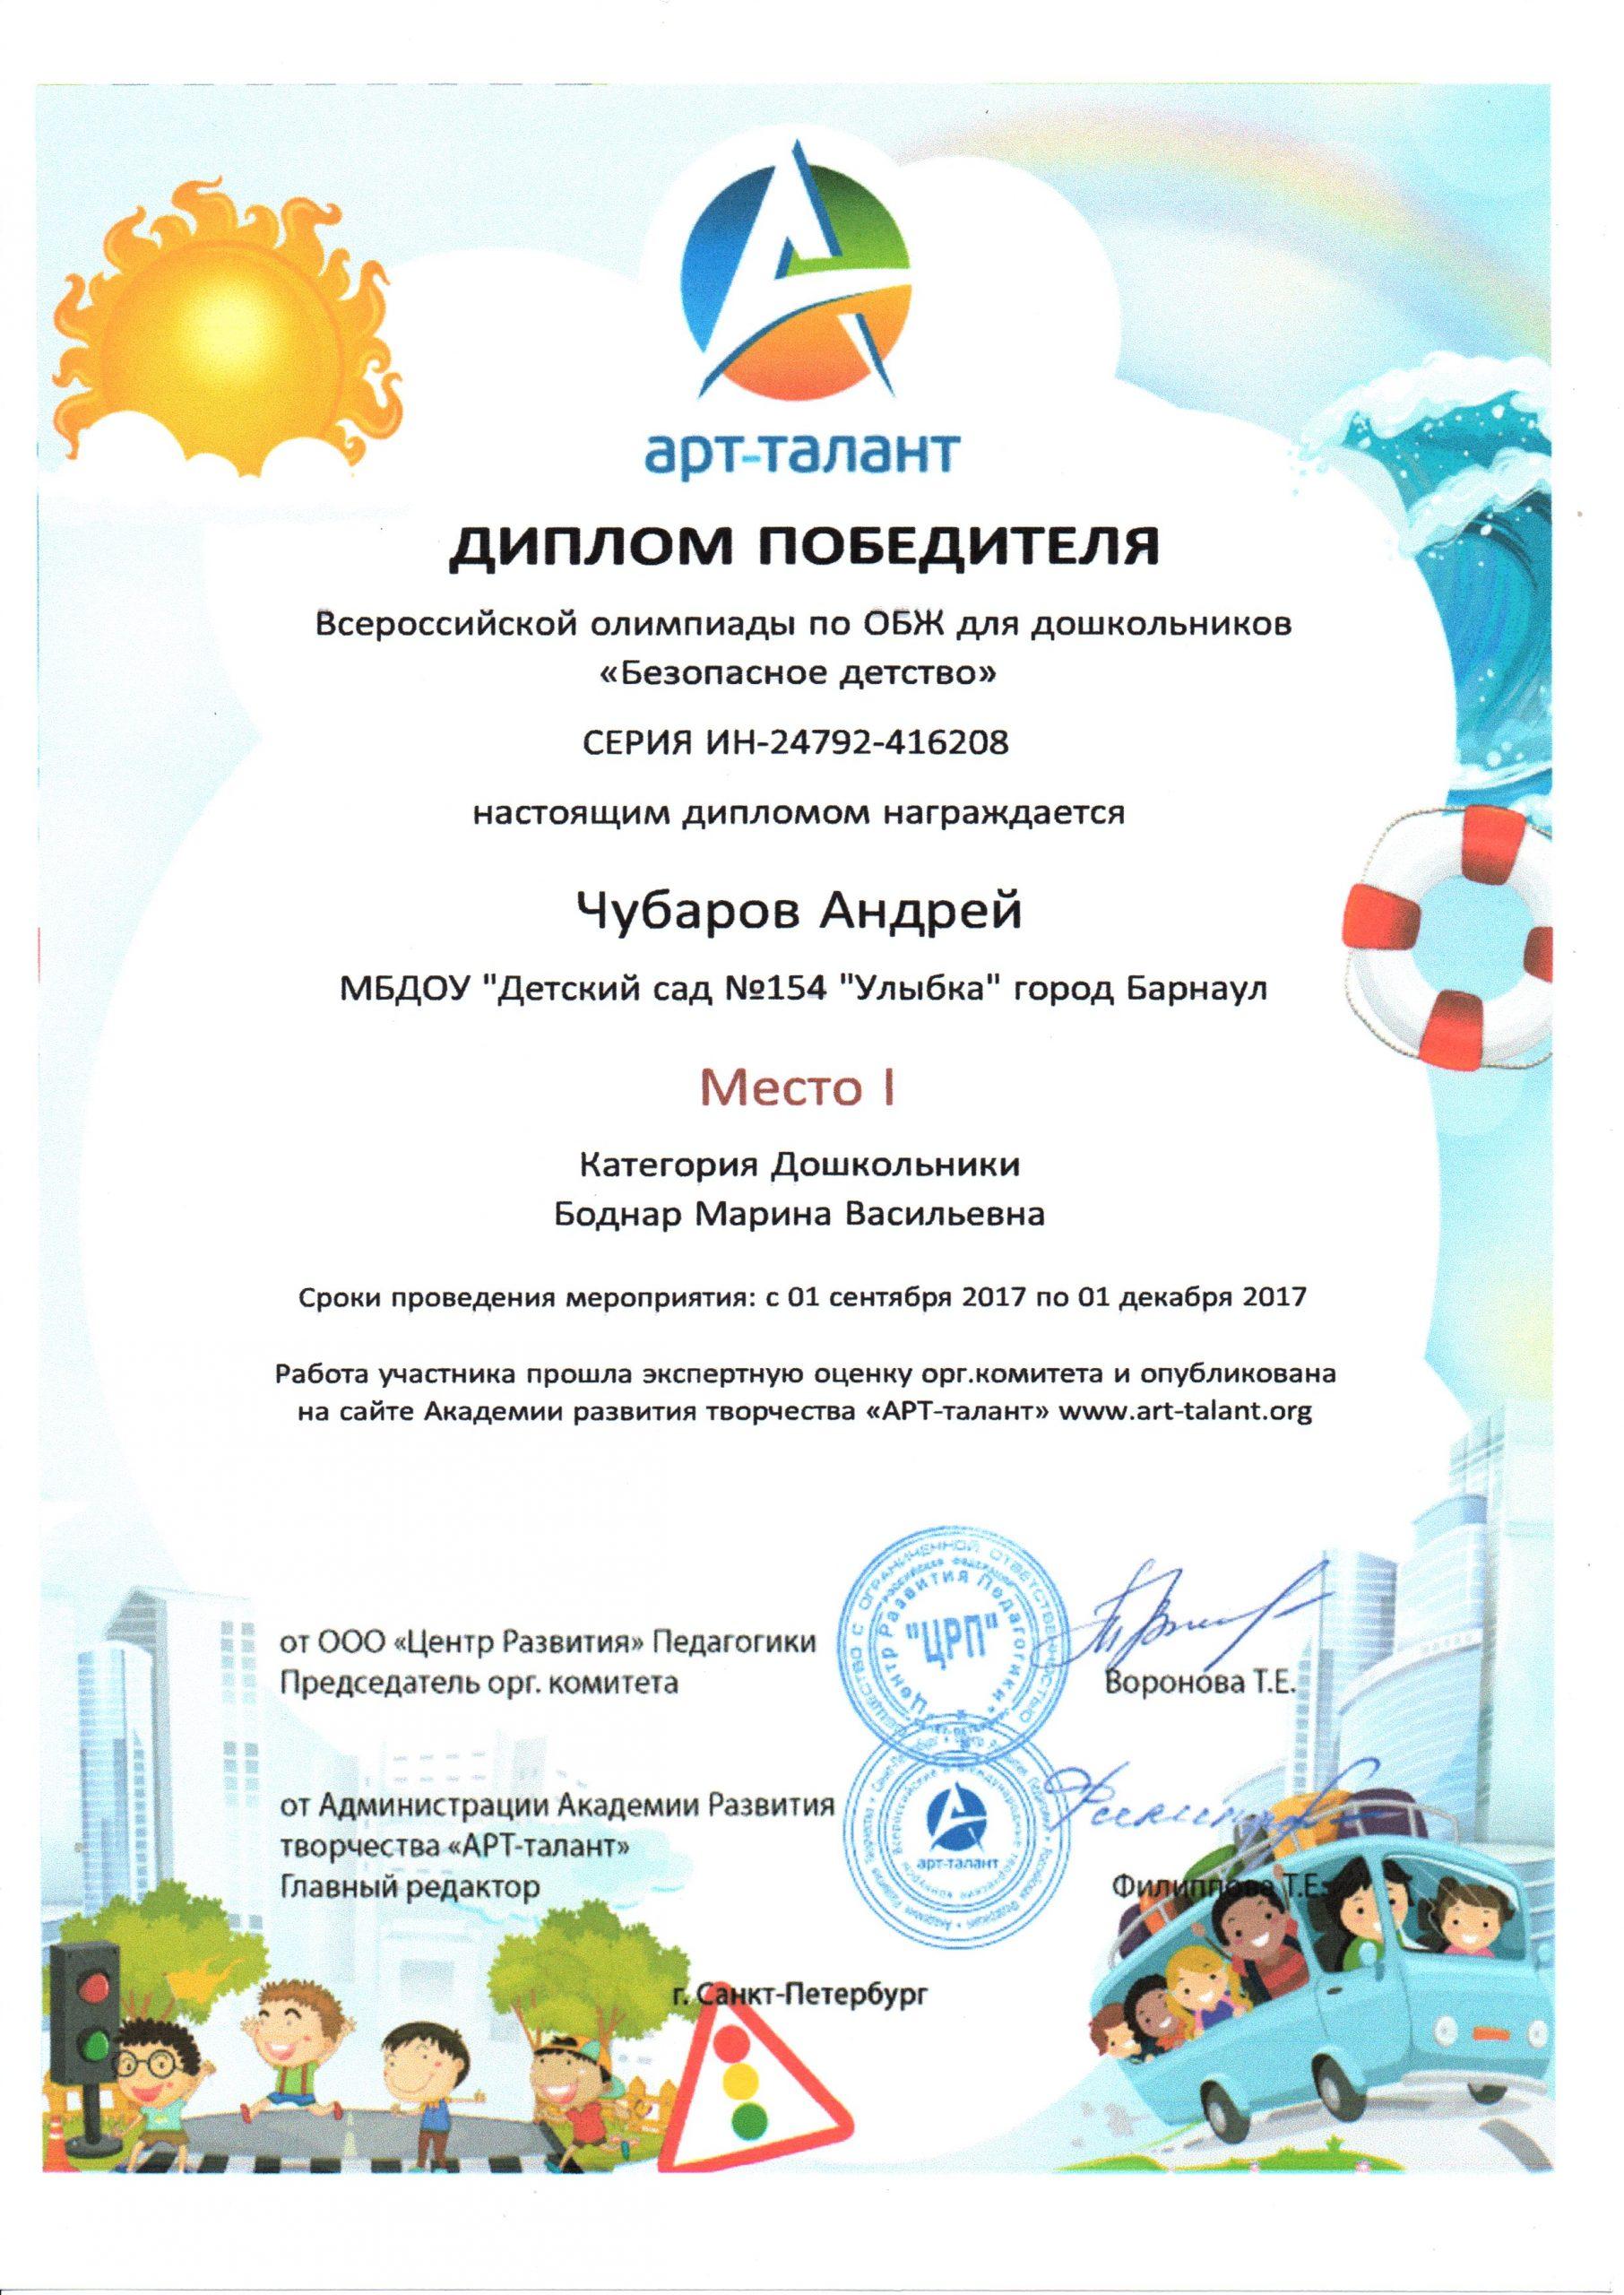 img20200915_12560153